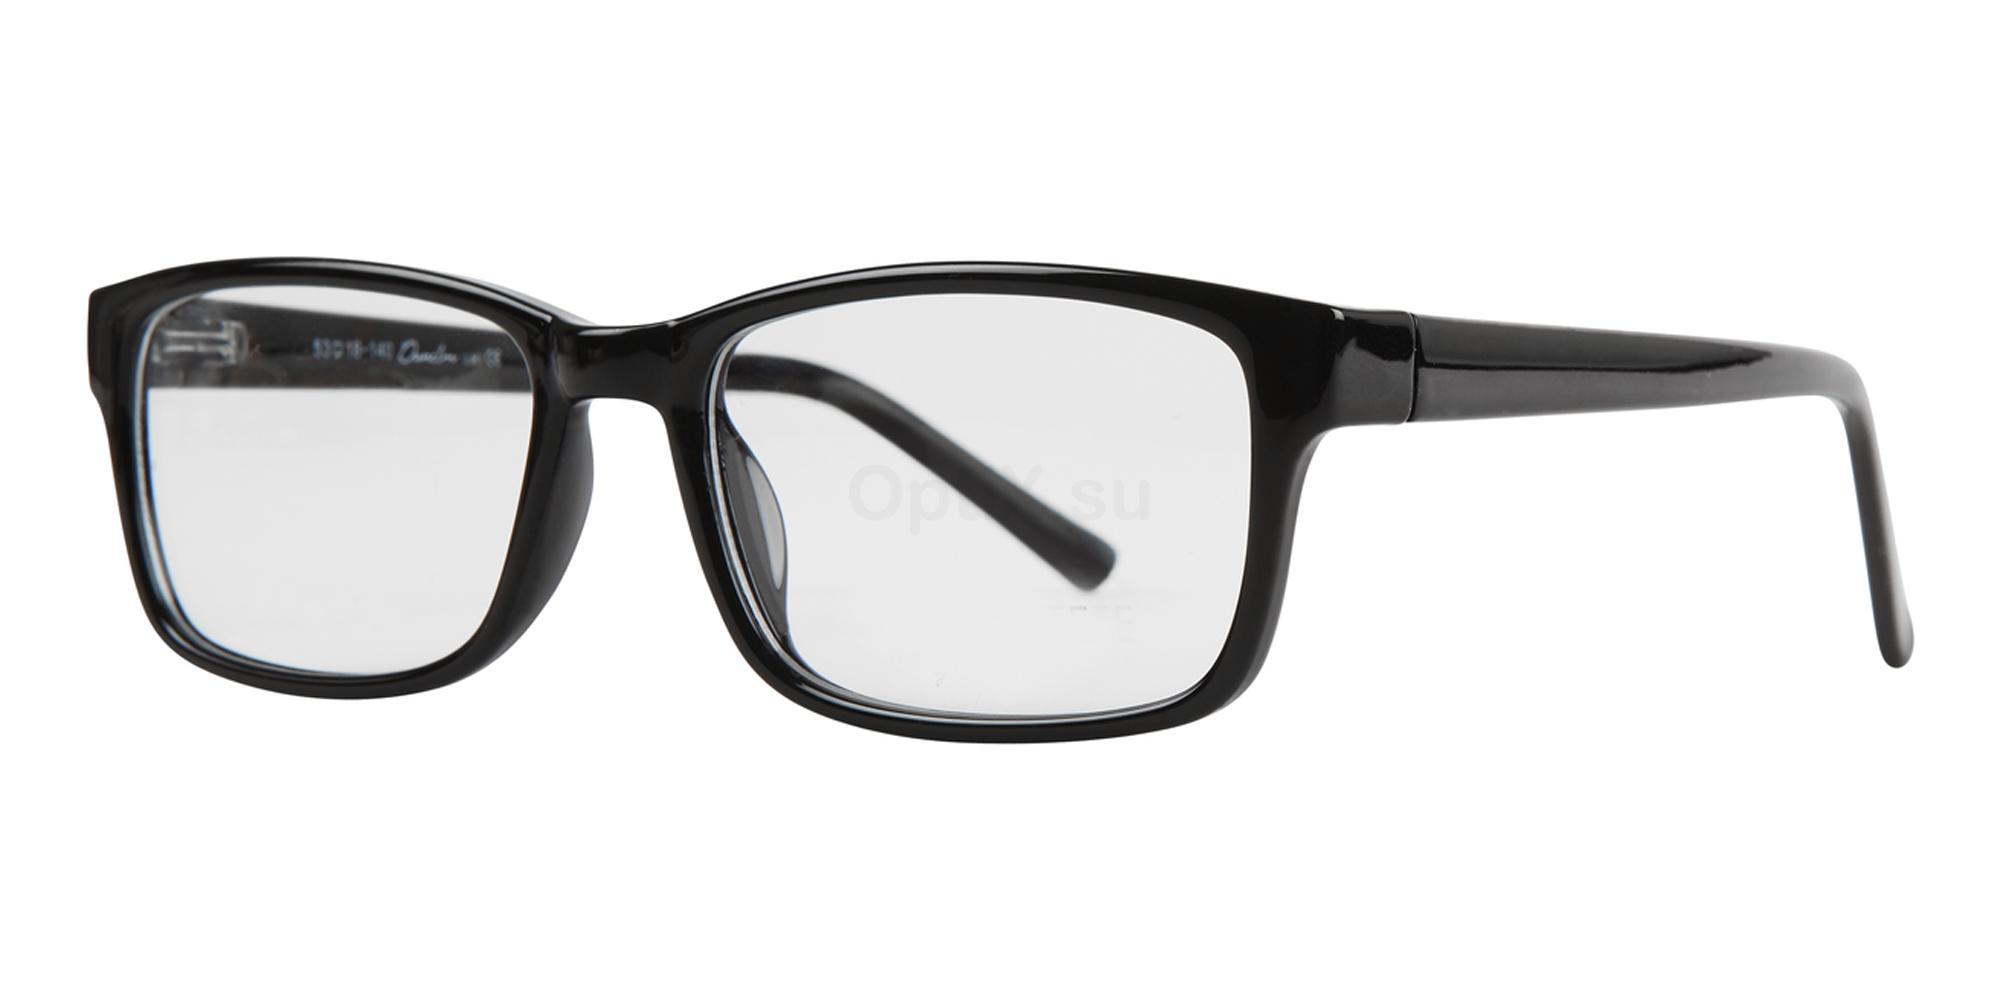 C1 Complete Mod 5 Glasses, Complete